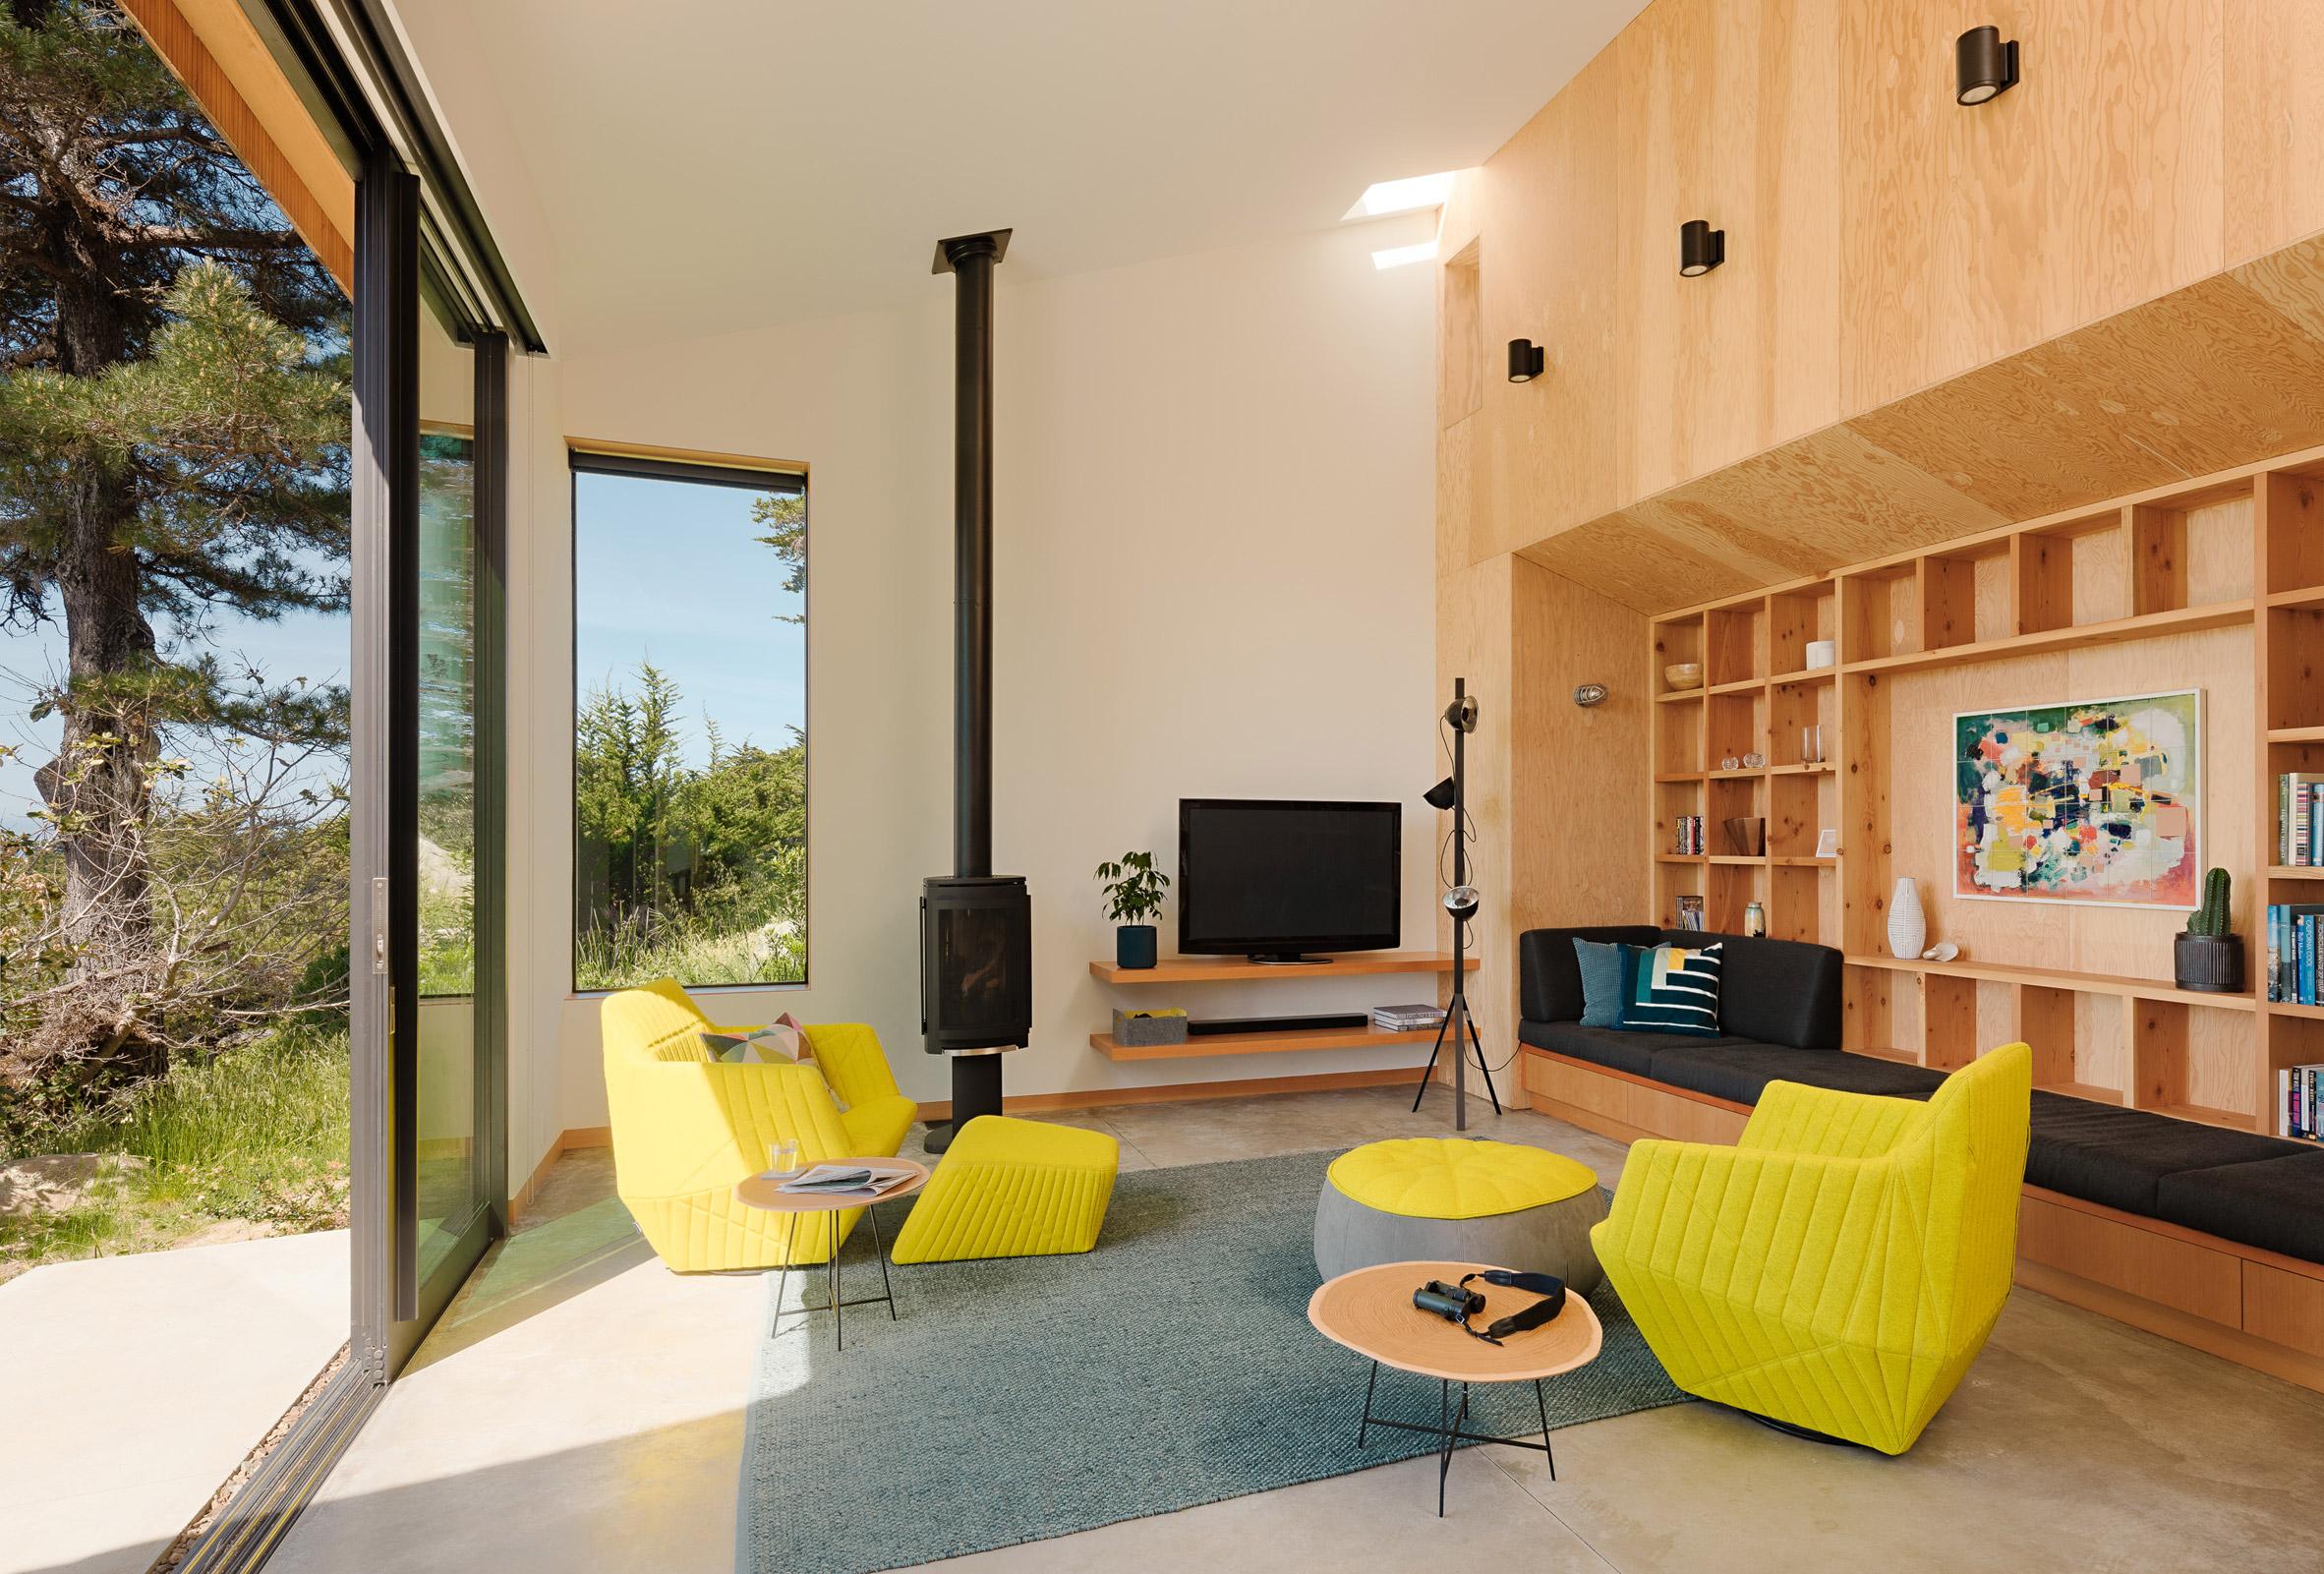 nhà bên biển coastal-retreat-malcolm-davis-architecture-sea-ranch-sonoma-county-califorinia-relaxing-space-elledecoration vn 5